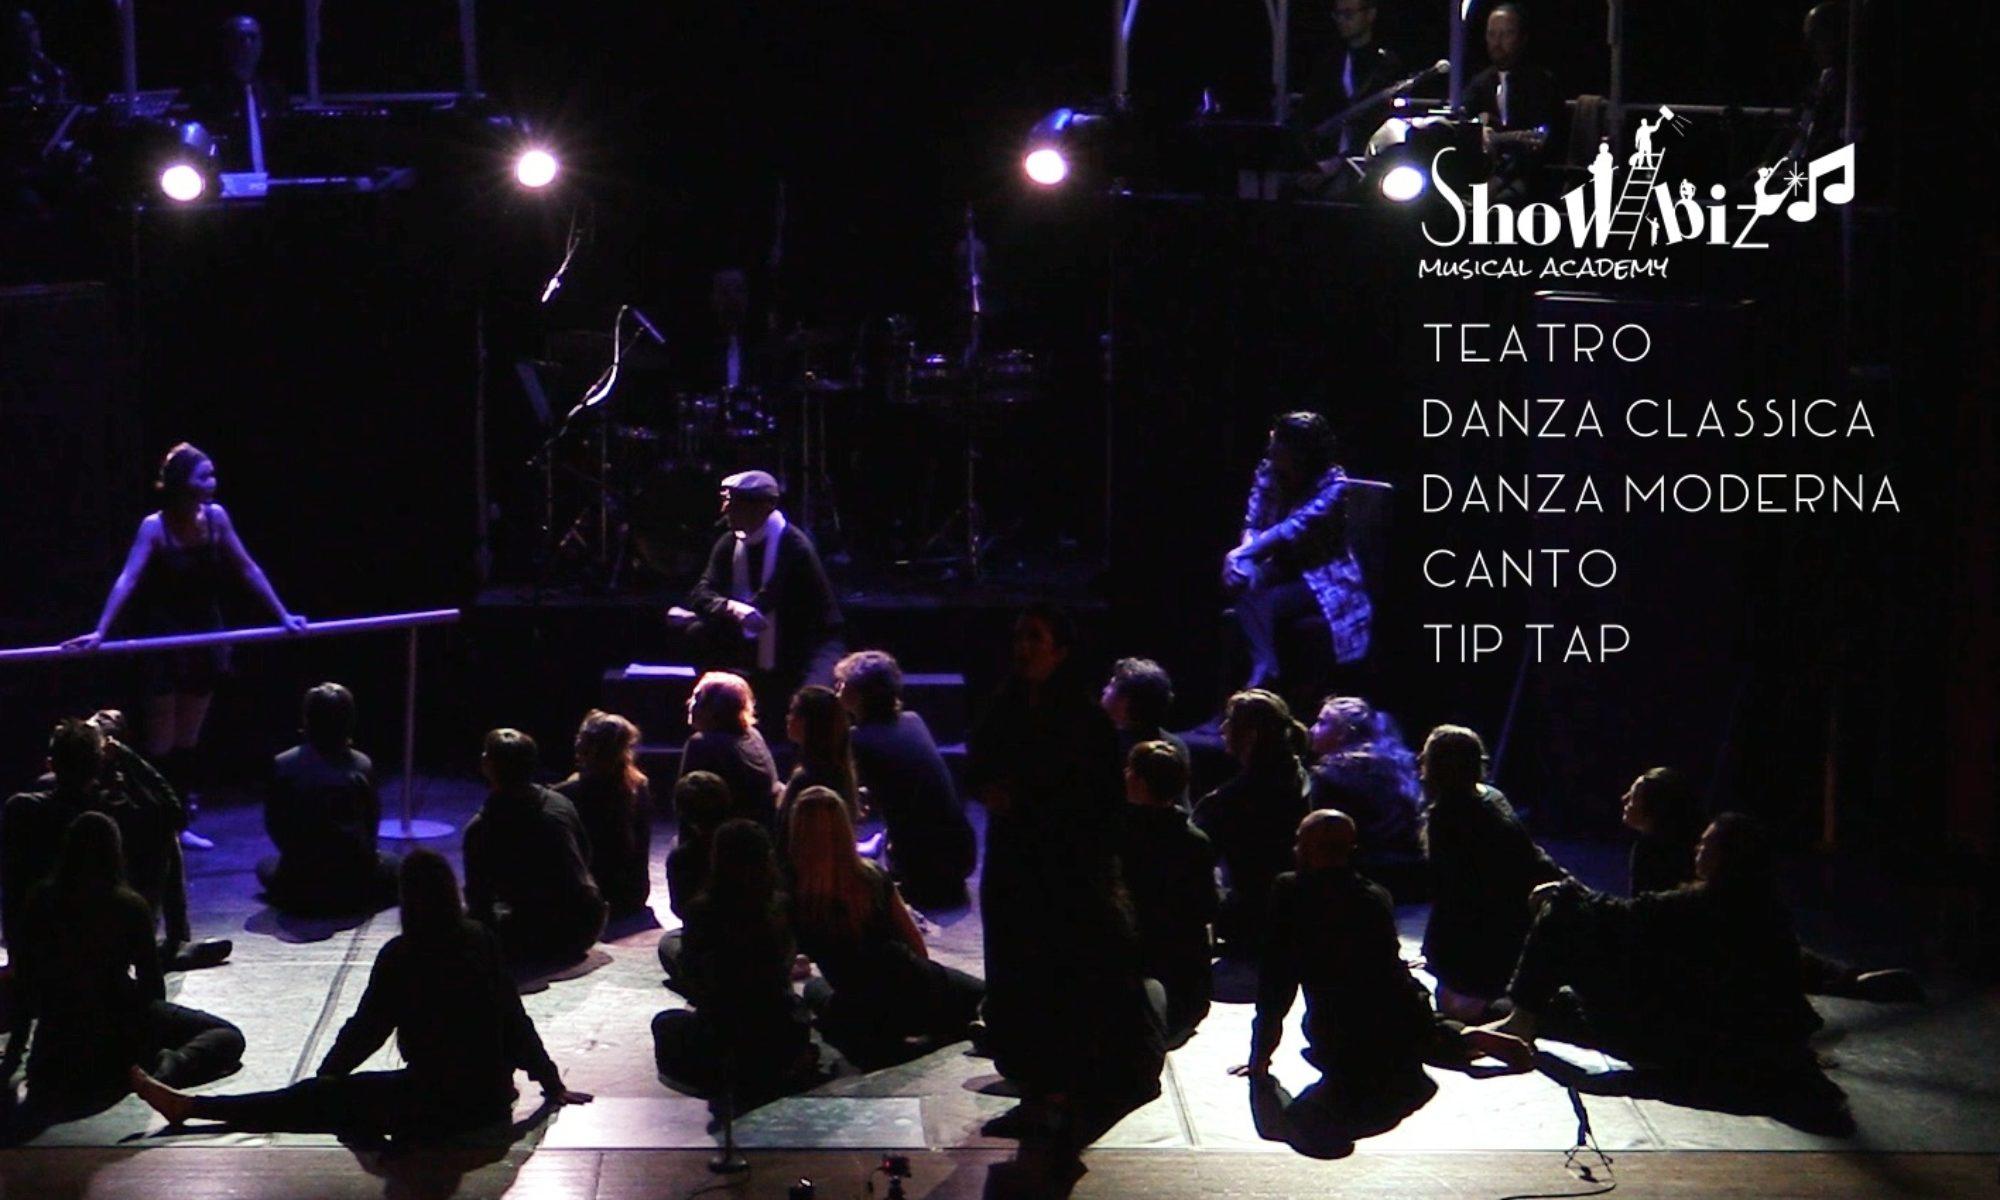 Accademia Musical Showbiz